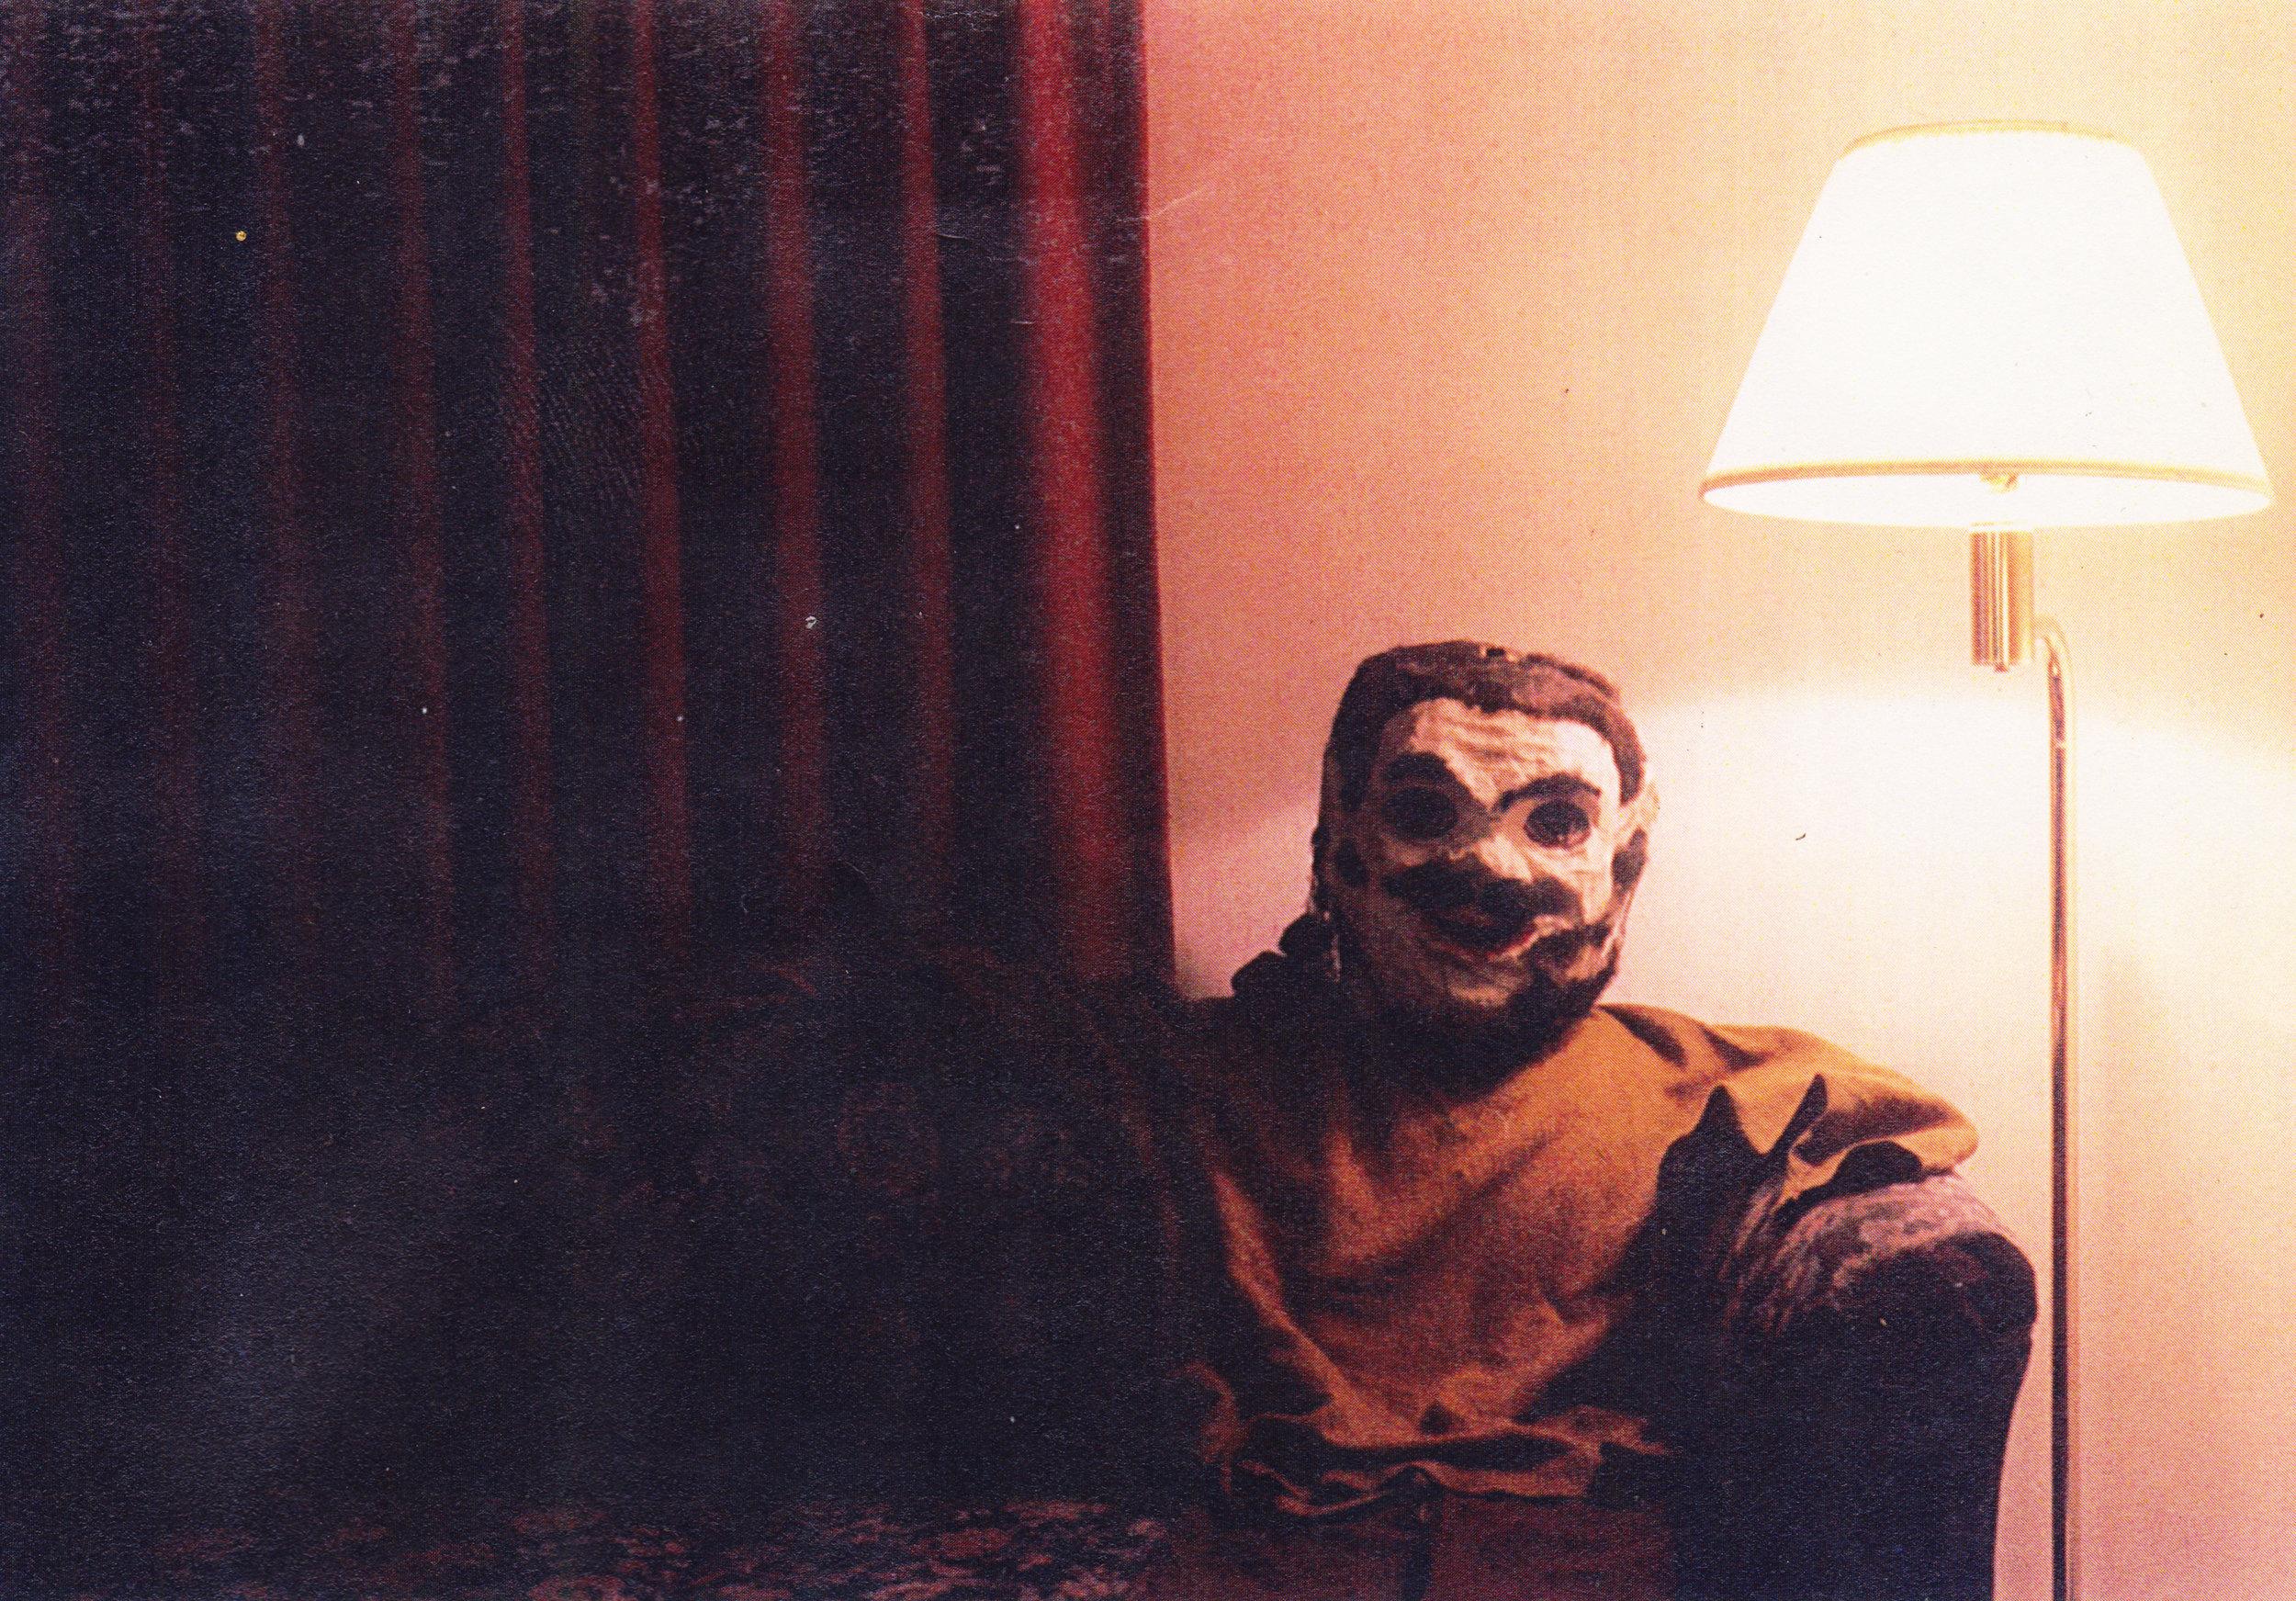 Paper maché head flat people pic taken in my hotel room in Arizona.